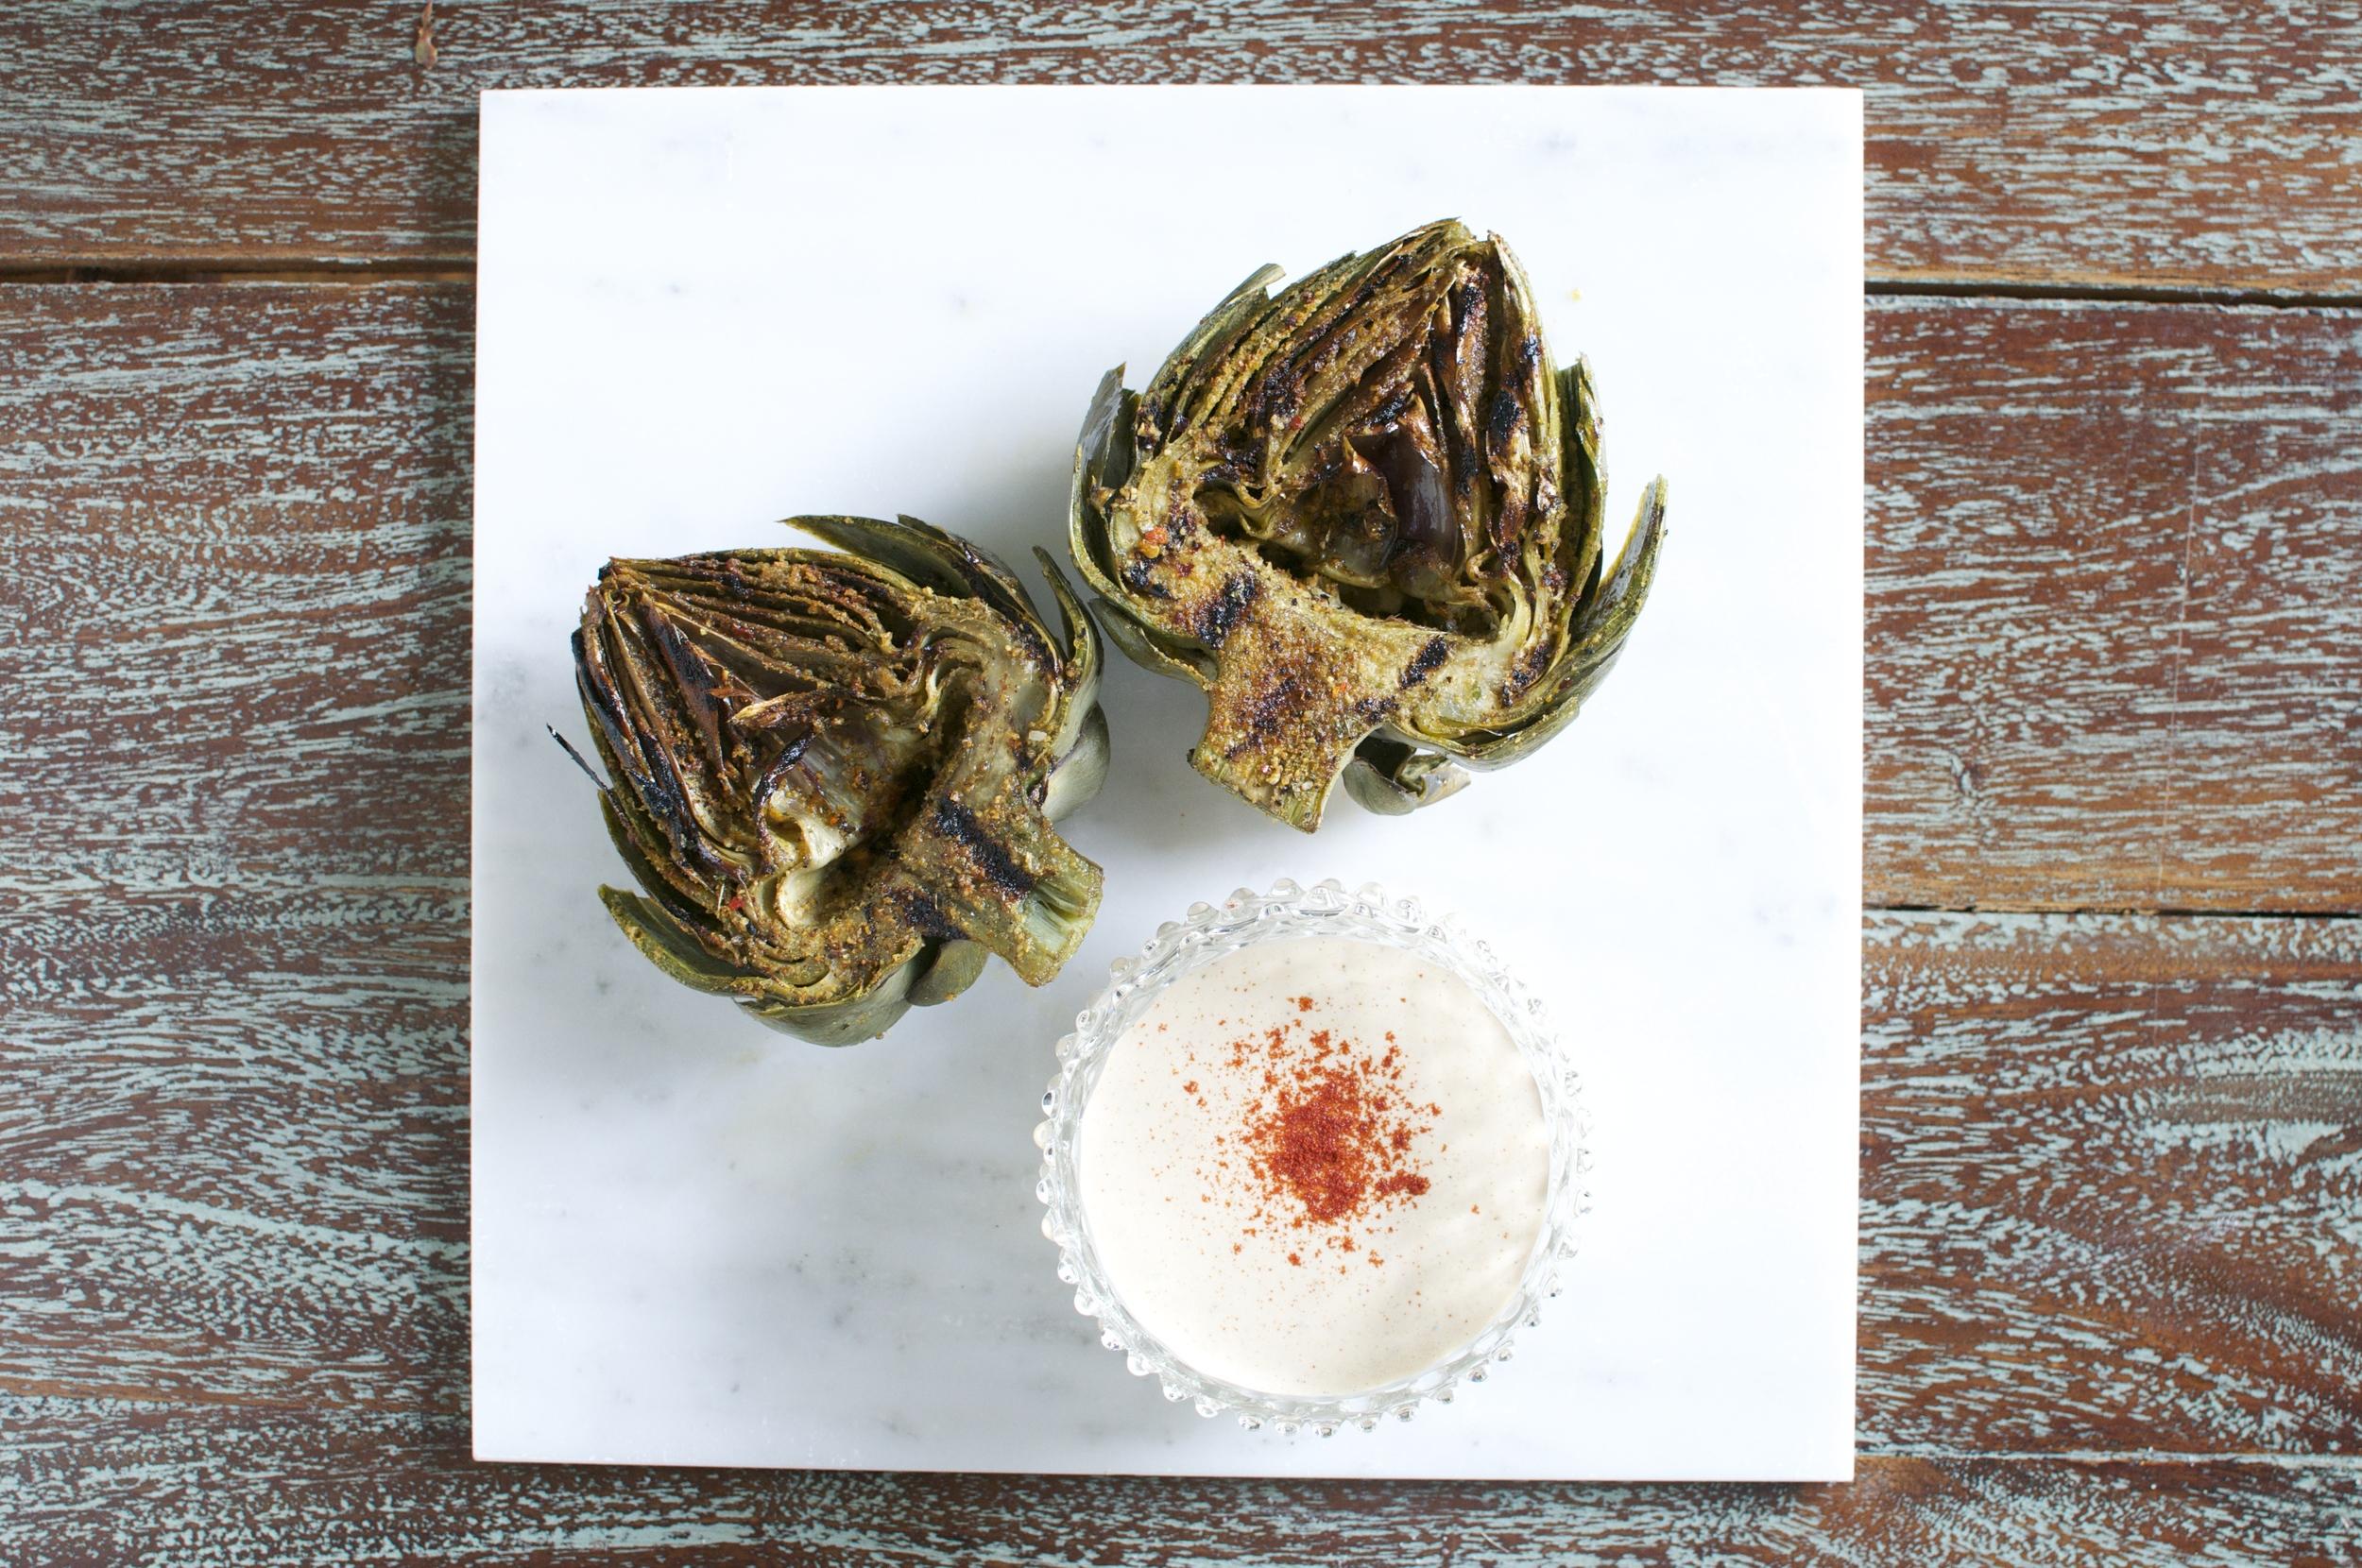 grilled artichokes with lemon worcestershire aioli | kitchen lush